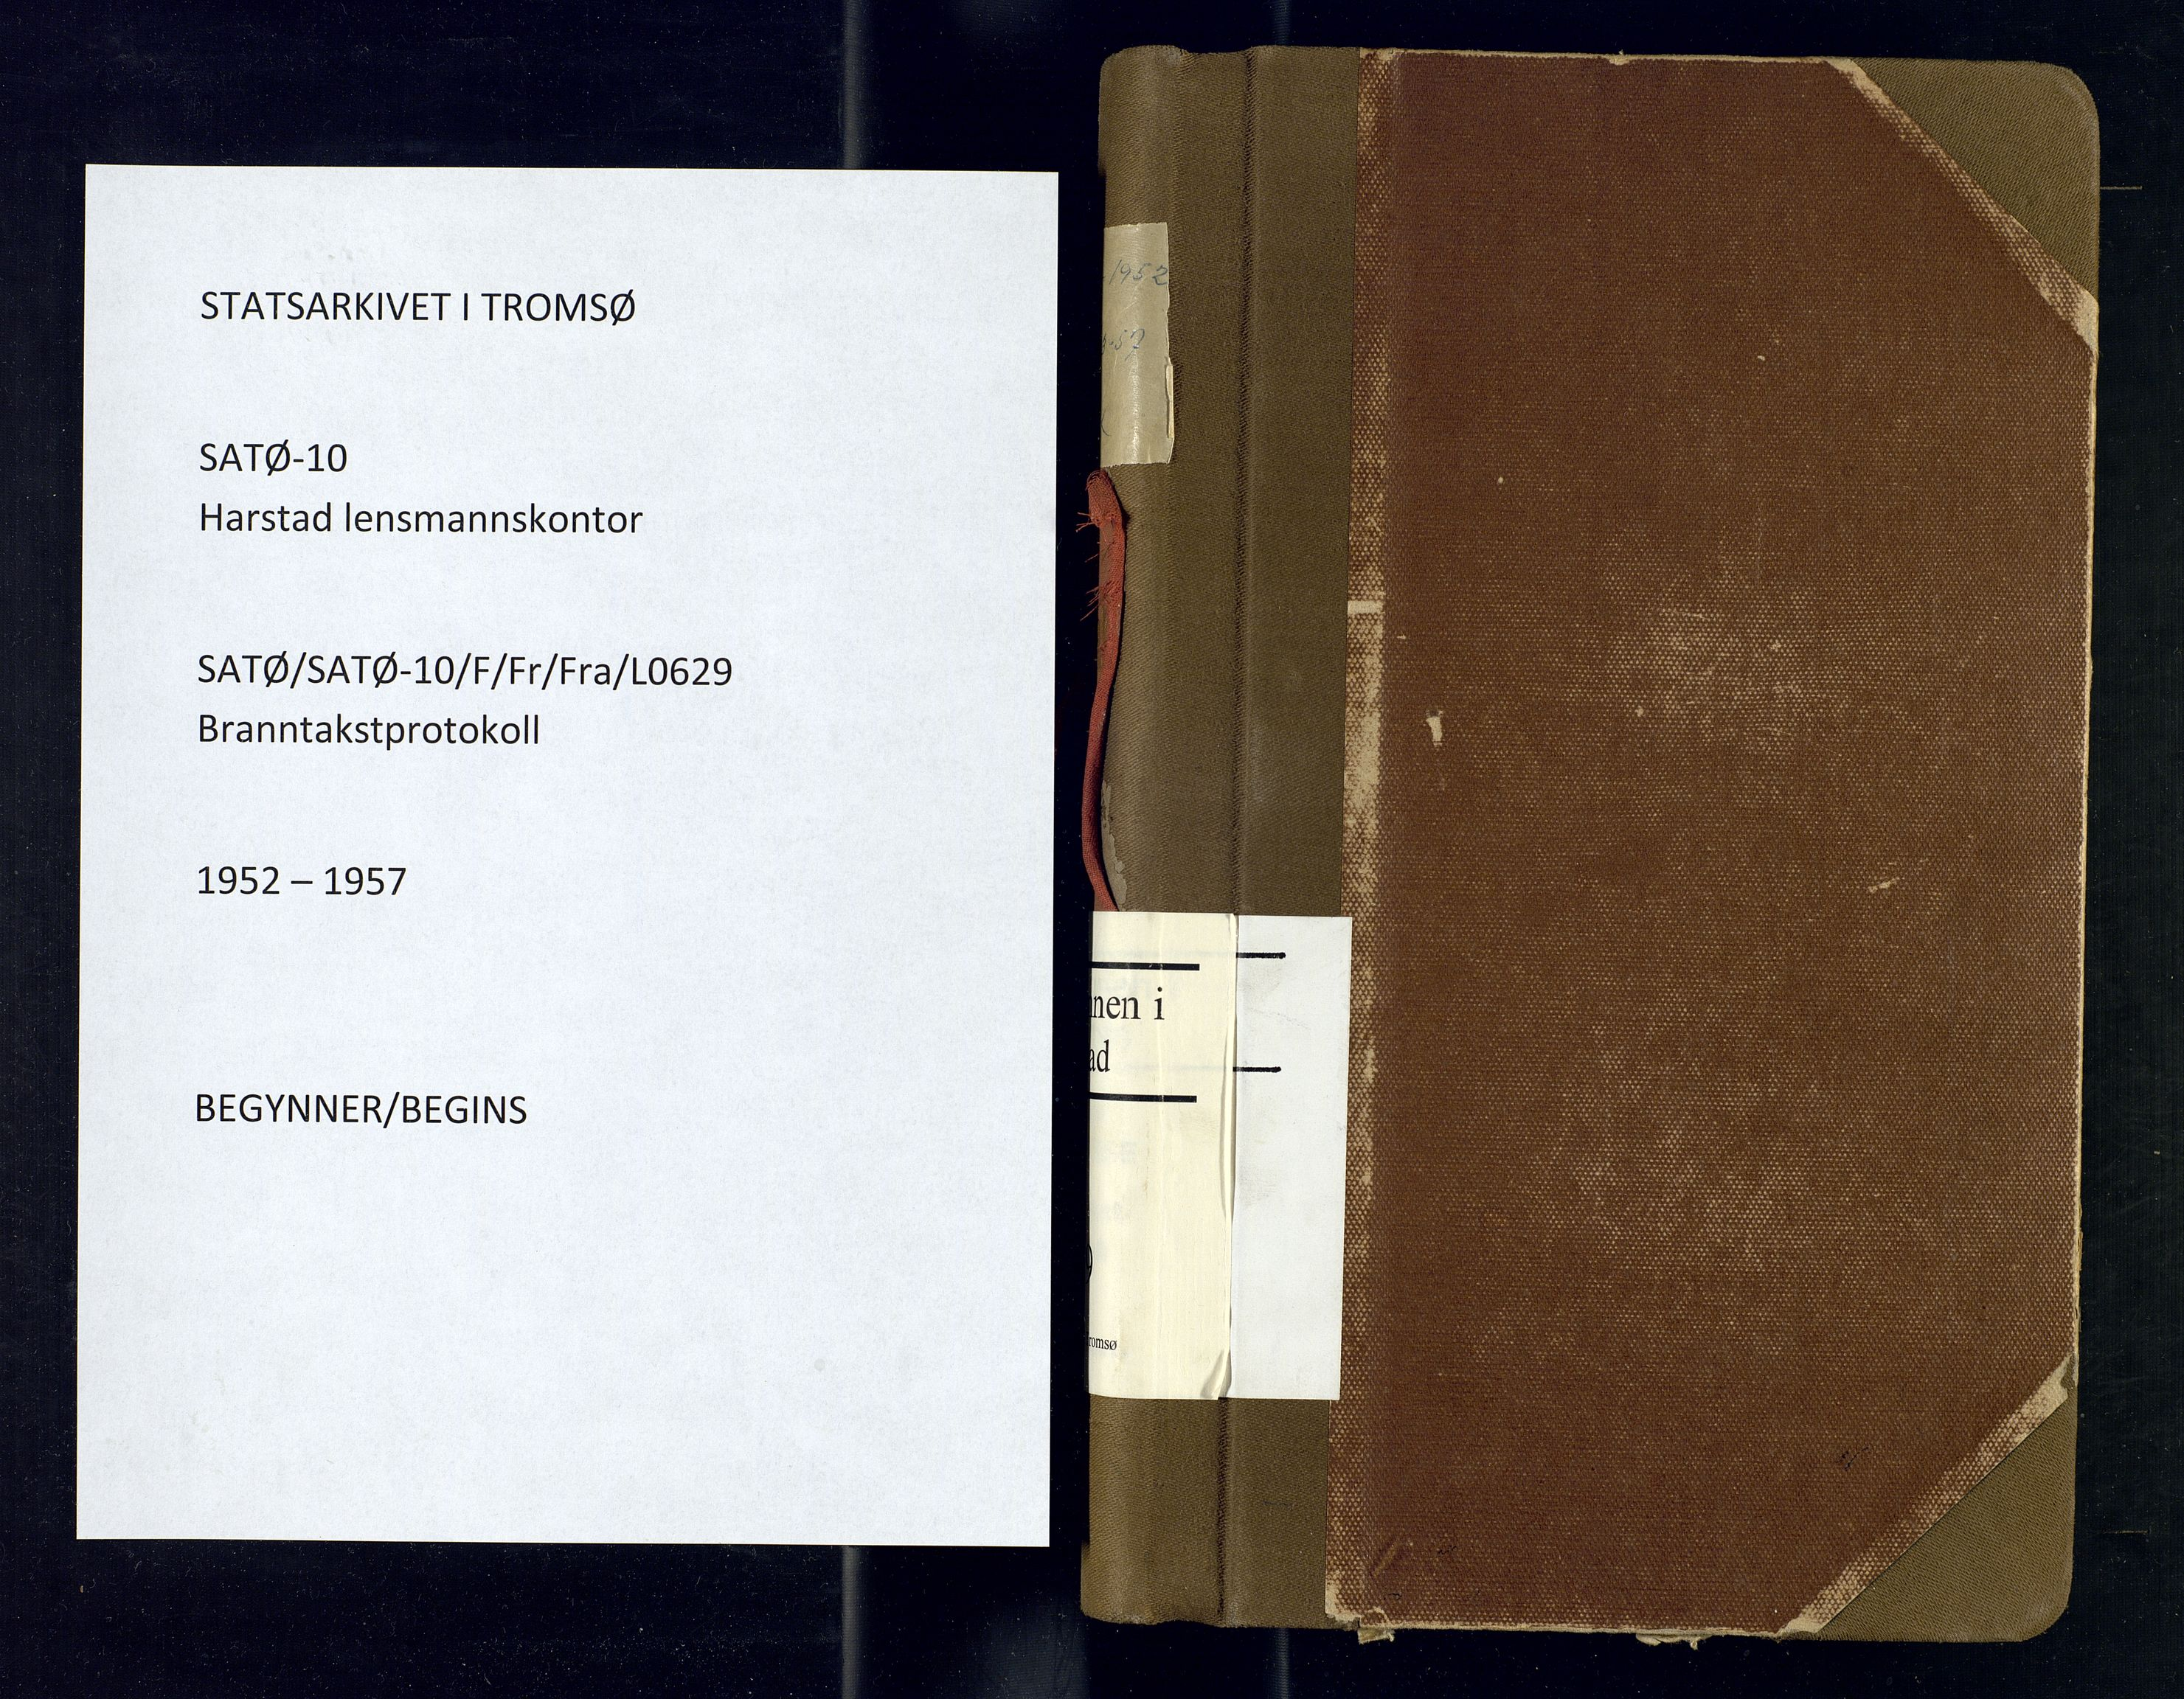 SATØ, Harstad lensmannskontor, F/Fr/Fra/L0629: Branntakstprotokoll. Autorisert for Harstad by, 1952-1957